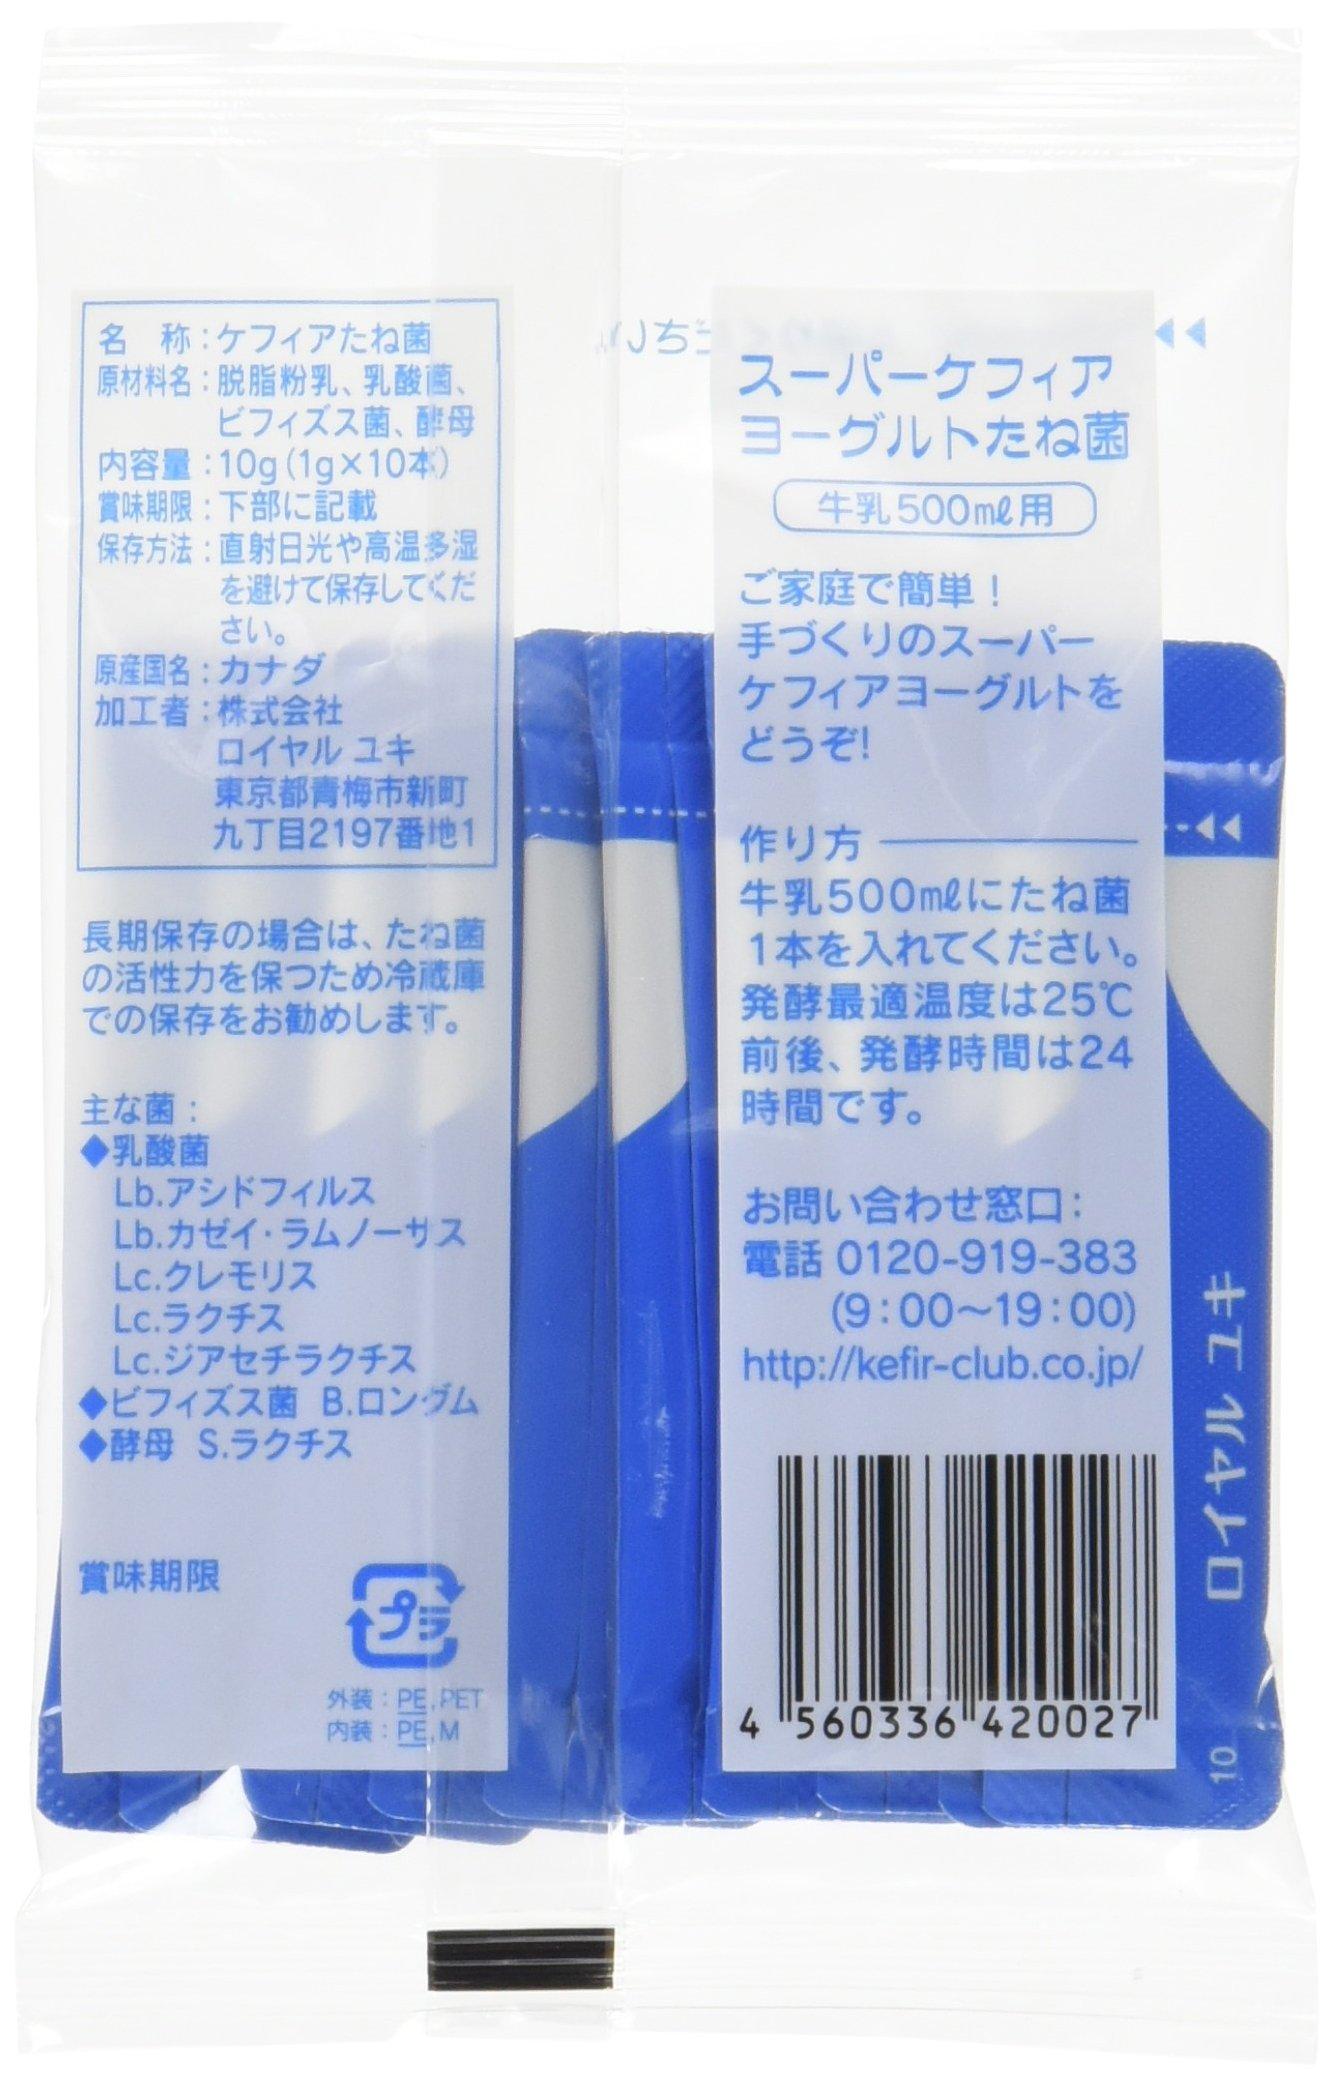 Super kefir yogurt Tanekin sixty by Ltd. Royal Snow (kefir Club) (Image #3)